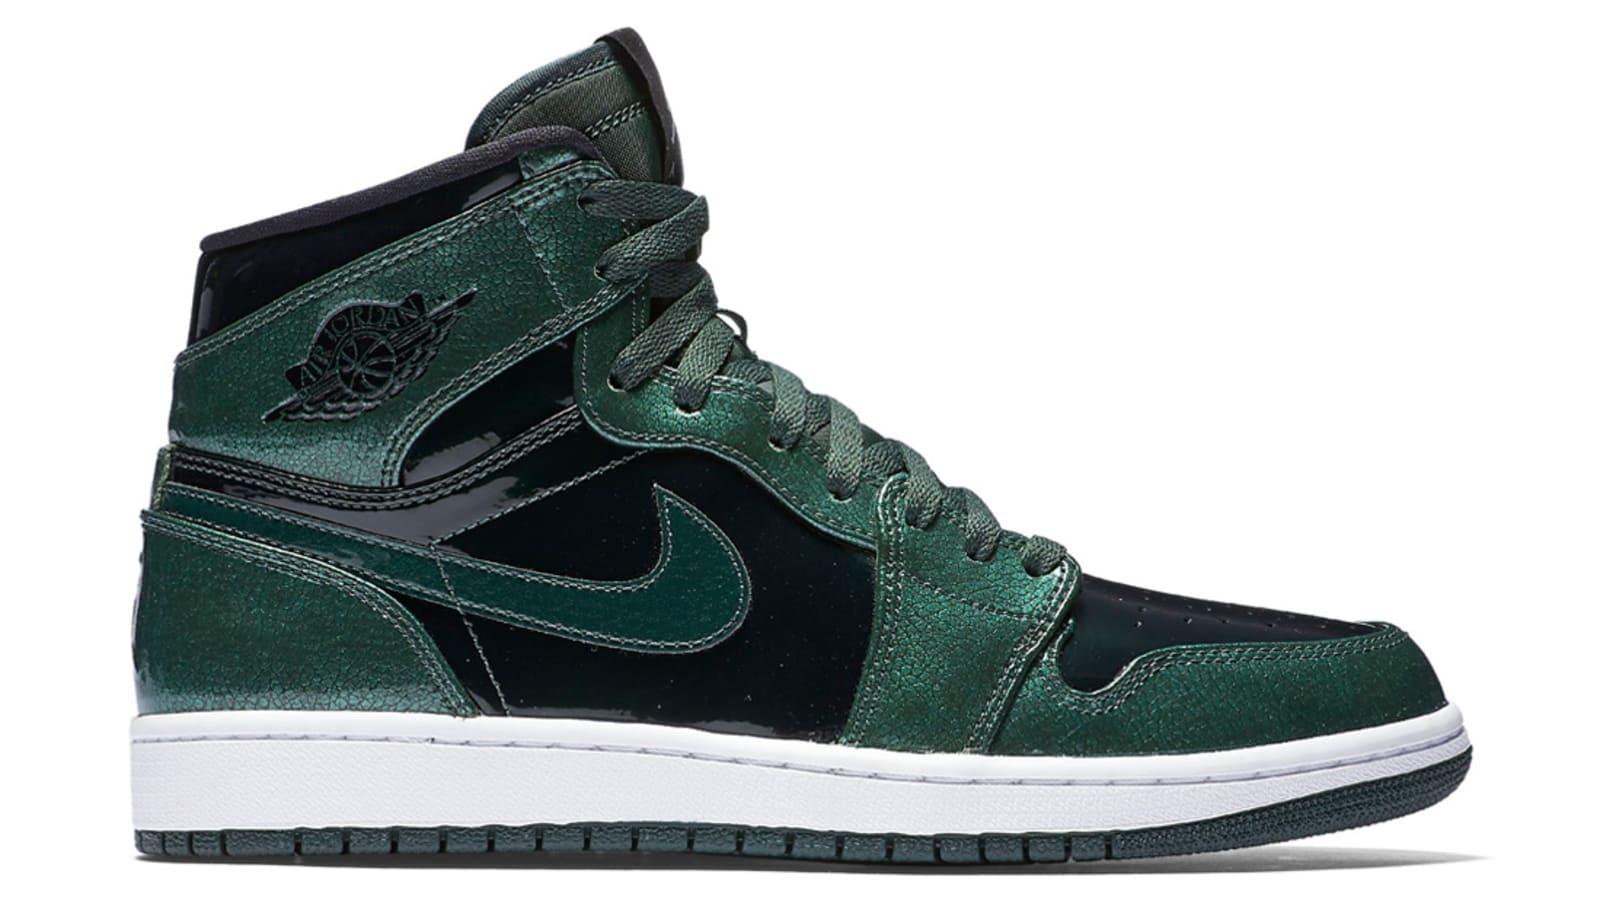 e894457d69cddc Air Jordan 1 High Grove Green 332550-300 - Air Jordan Release Dates ...